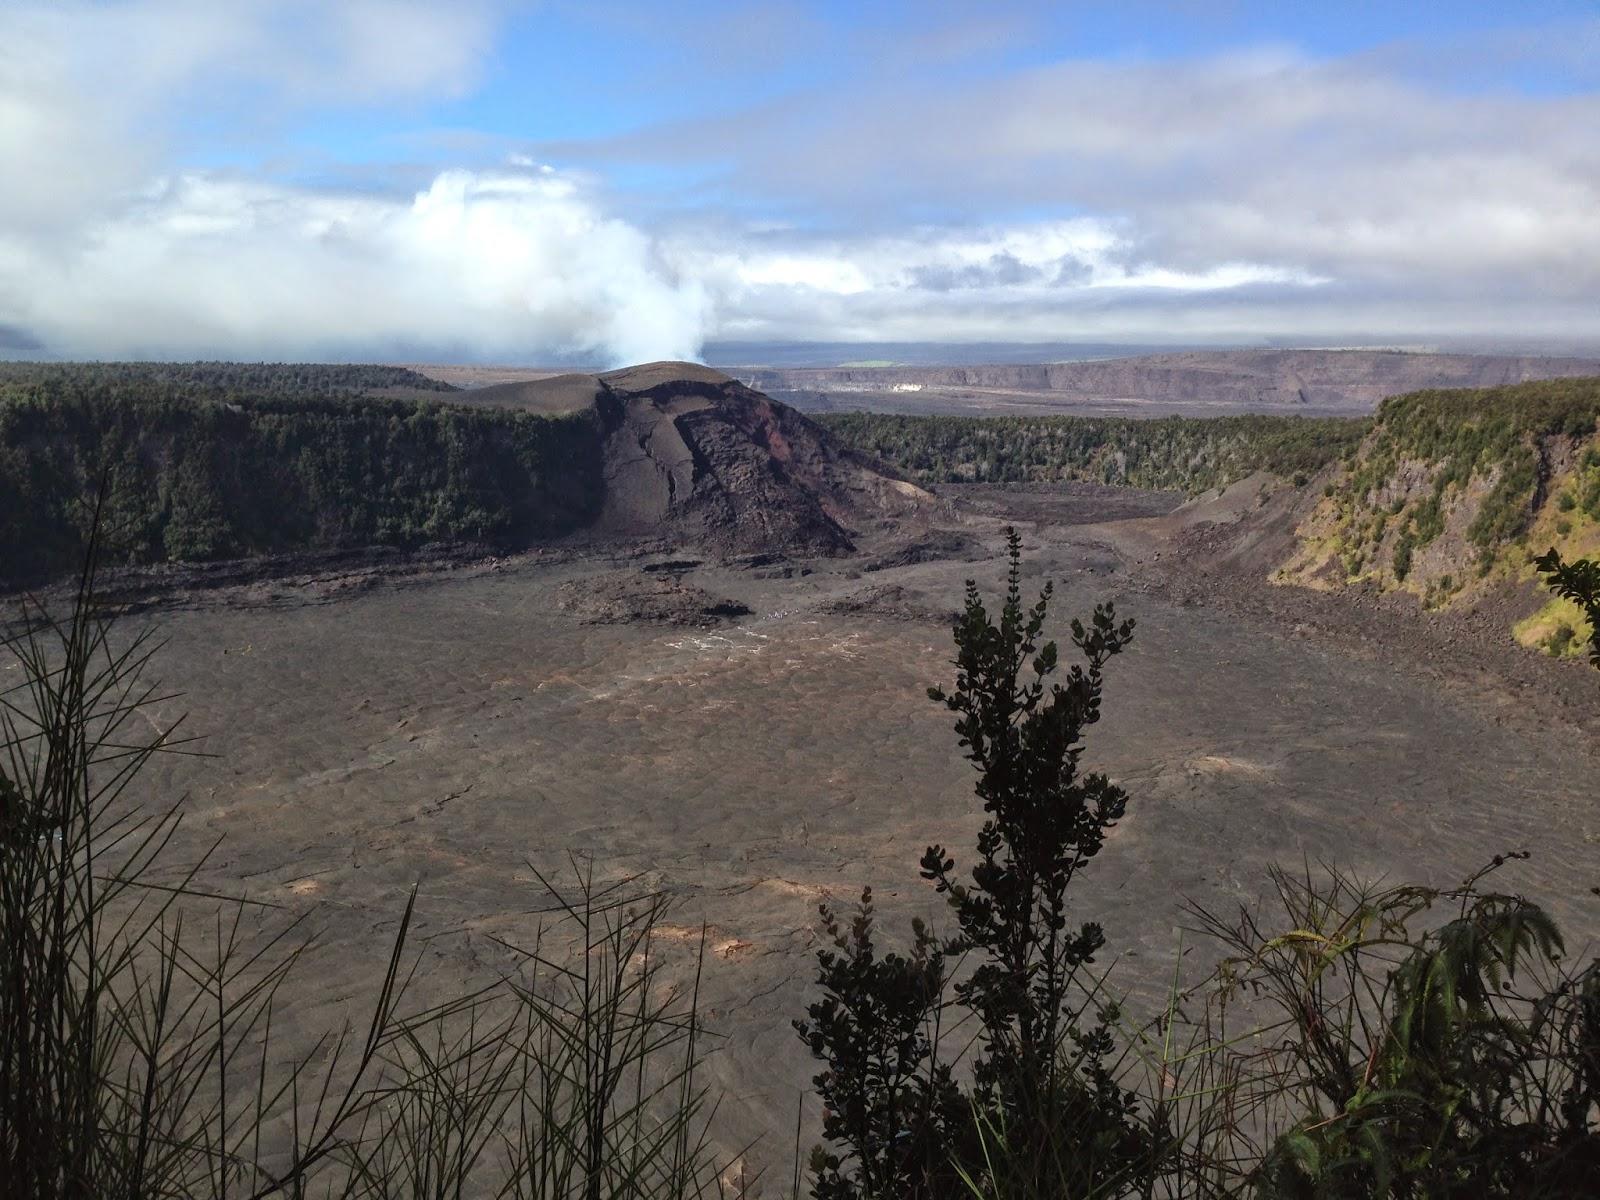 Kilauea volcano in Hilo